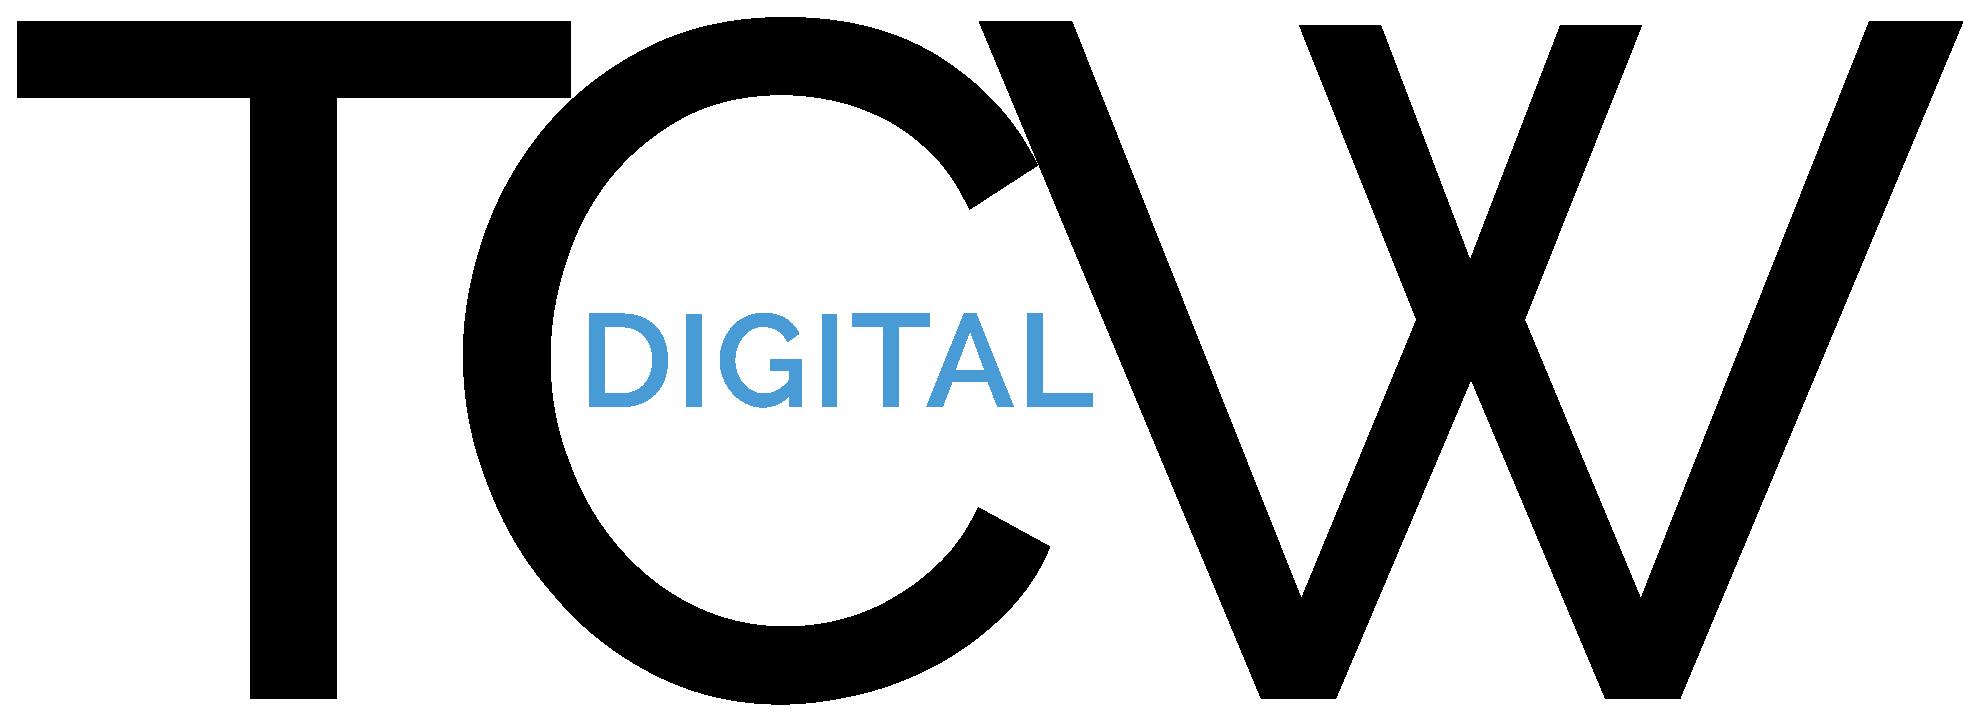 TCW Digital